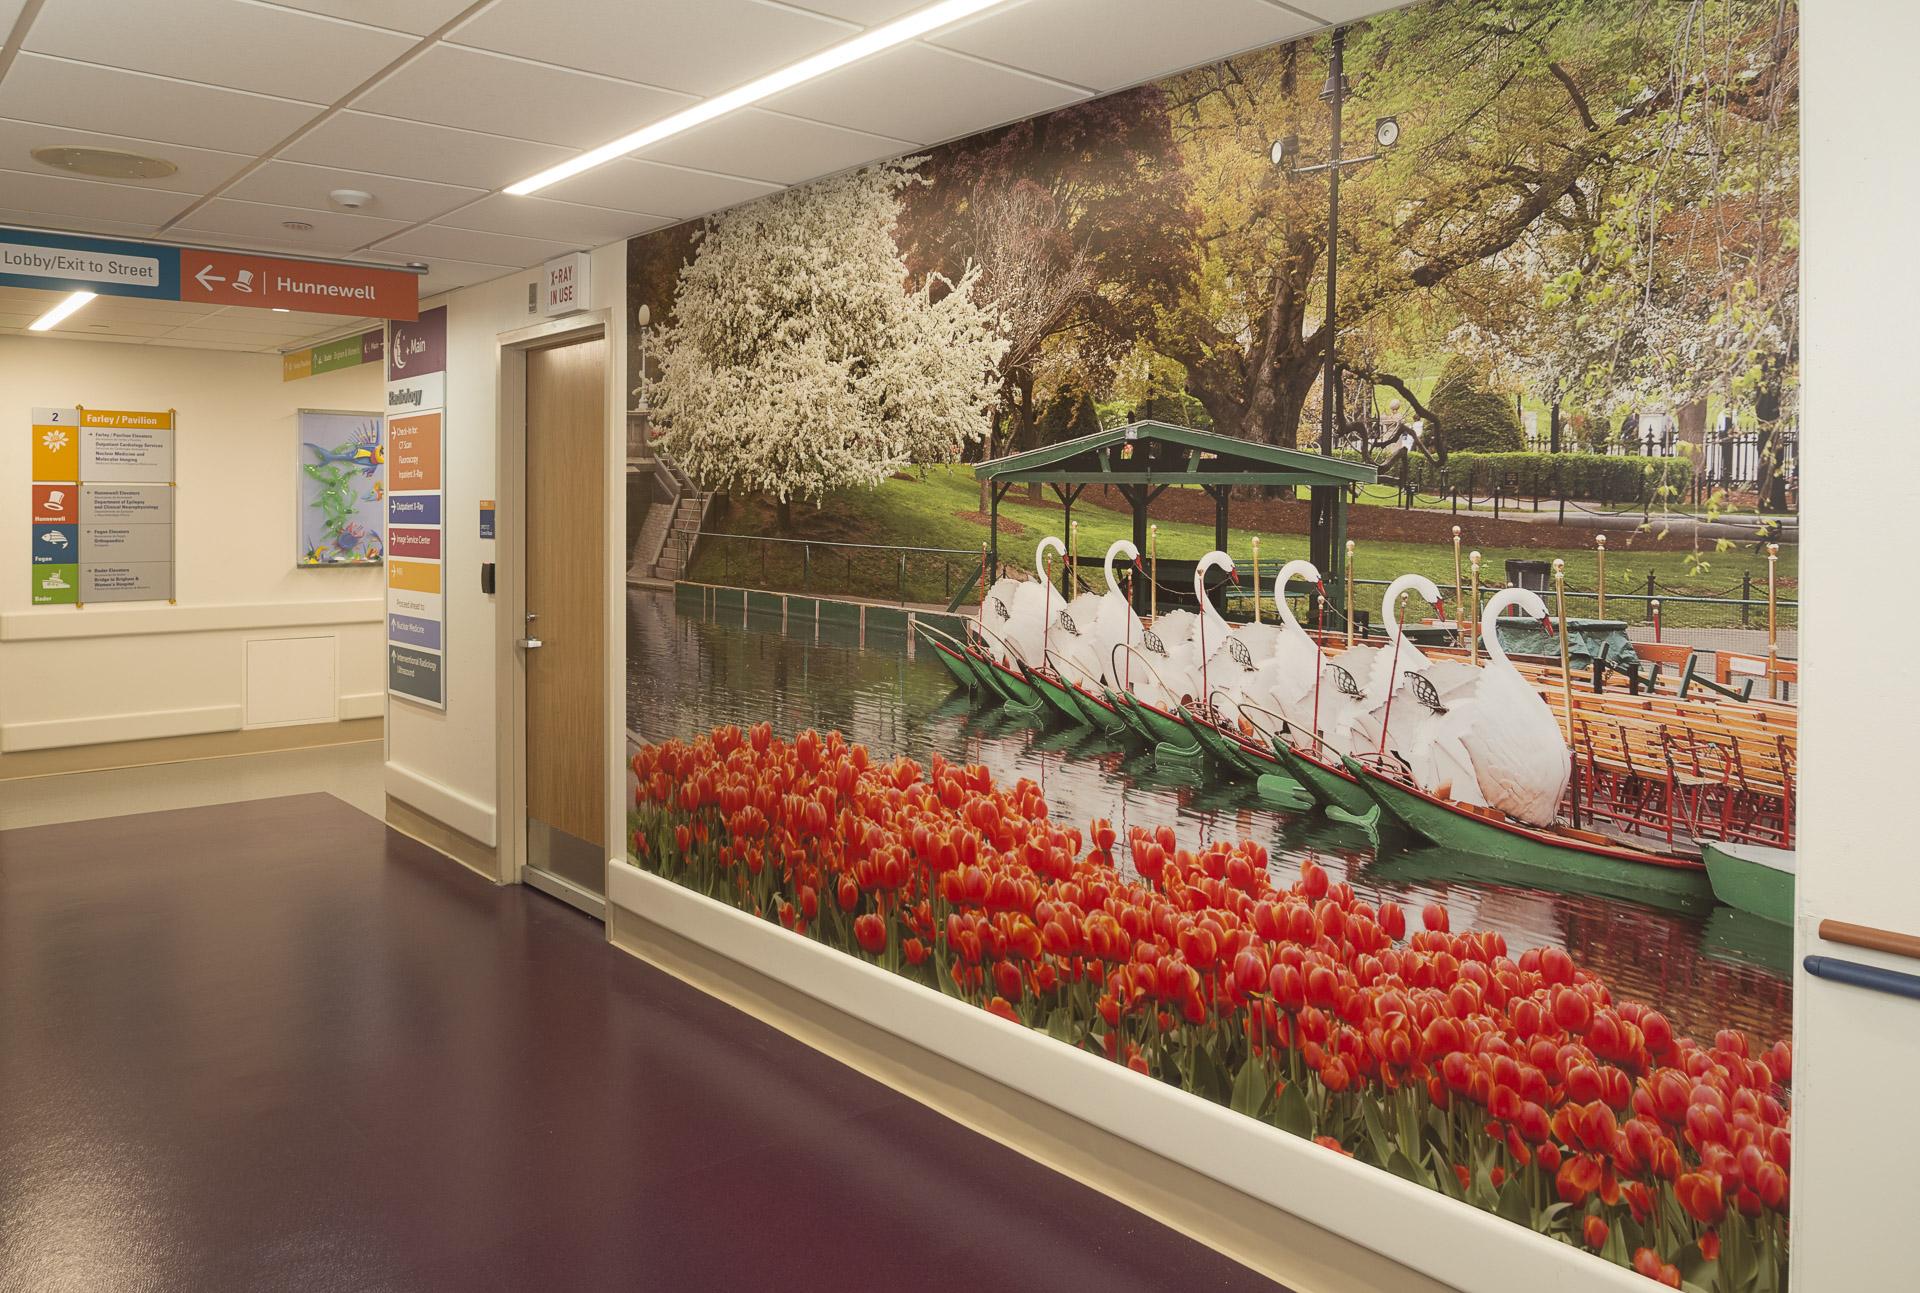 Children's Hospital, Longwood Ave, Boston, MA